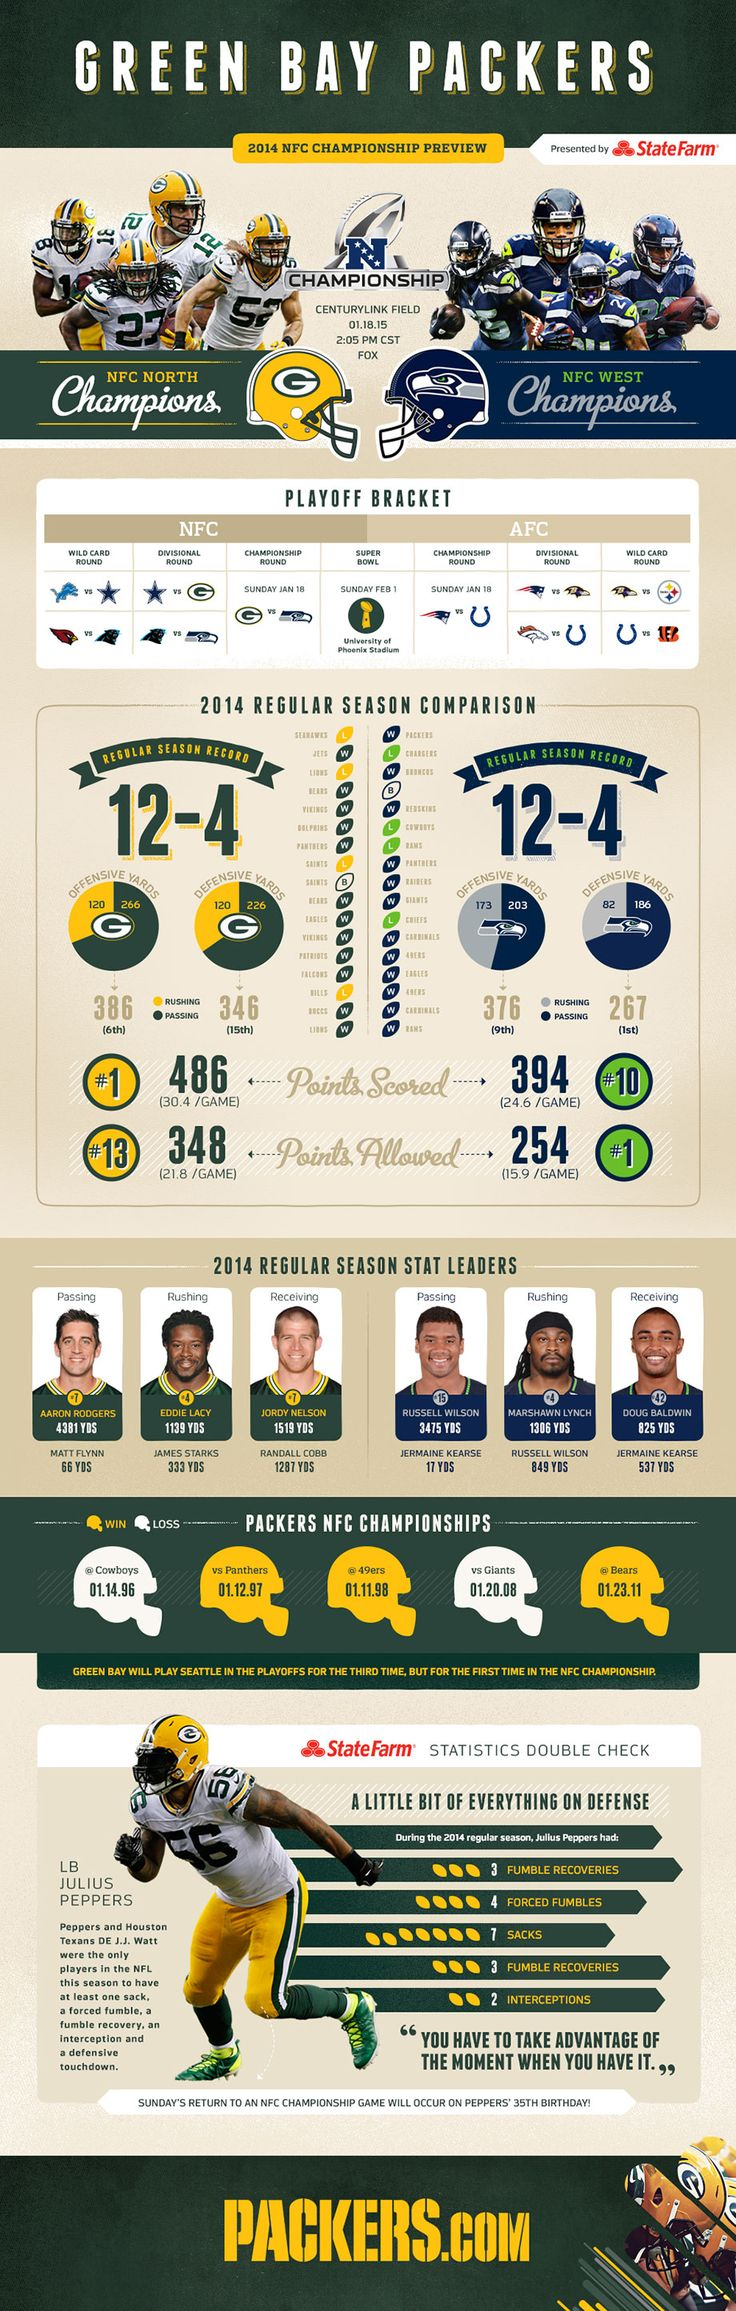 Packers Vs. Seahawks NFC  2014/2015 NFC Championship